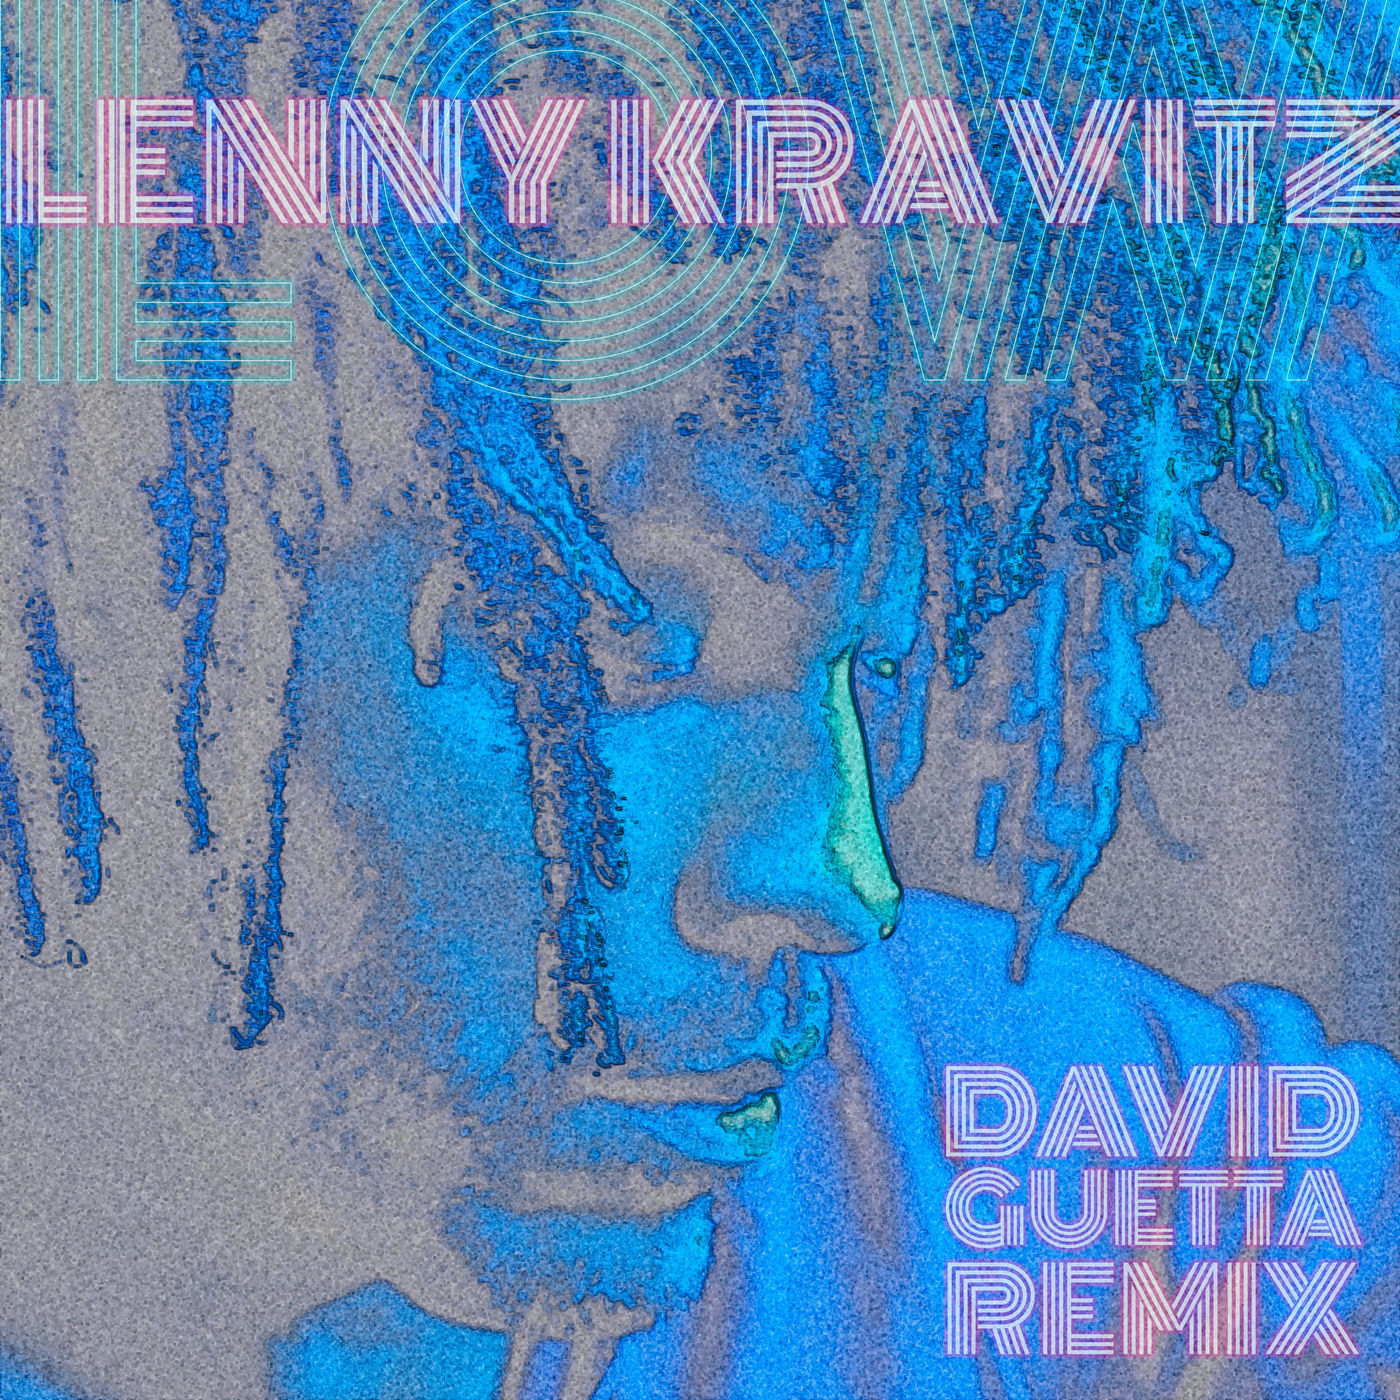 Lenny Kravitz - Low  (David Guetta Remix)